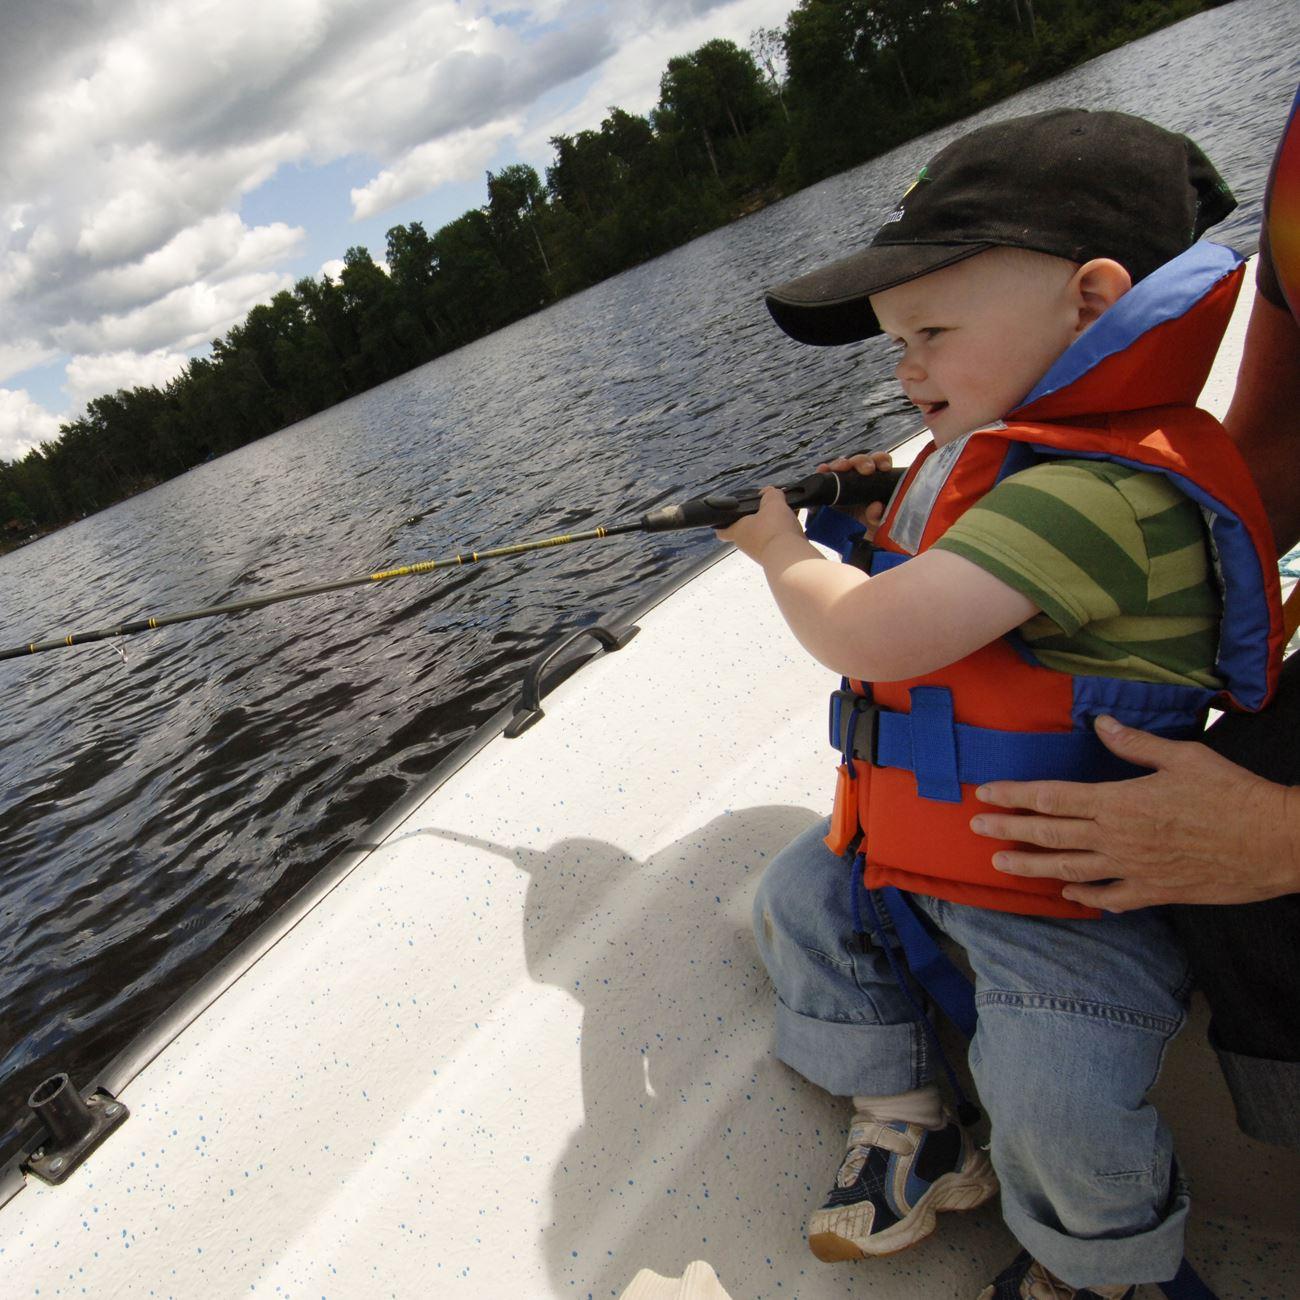 Fiske i Rannäsasjön